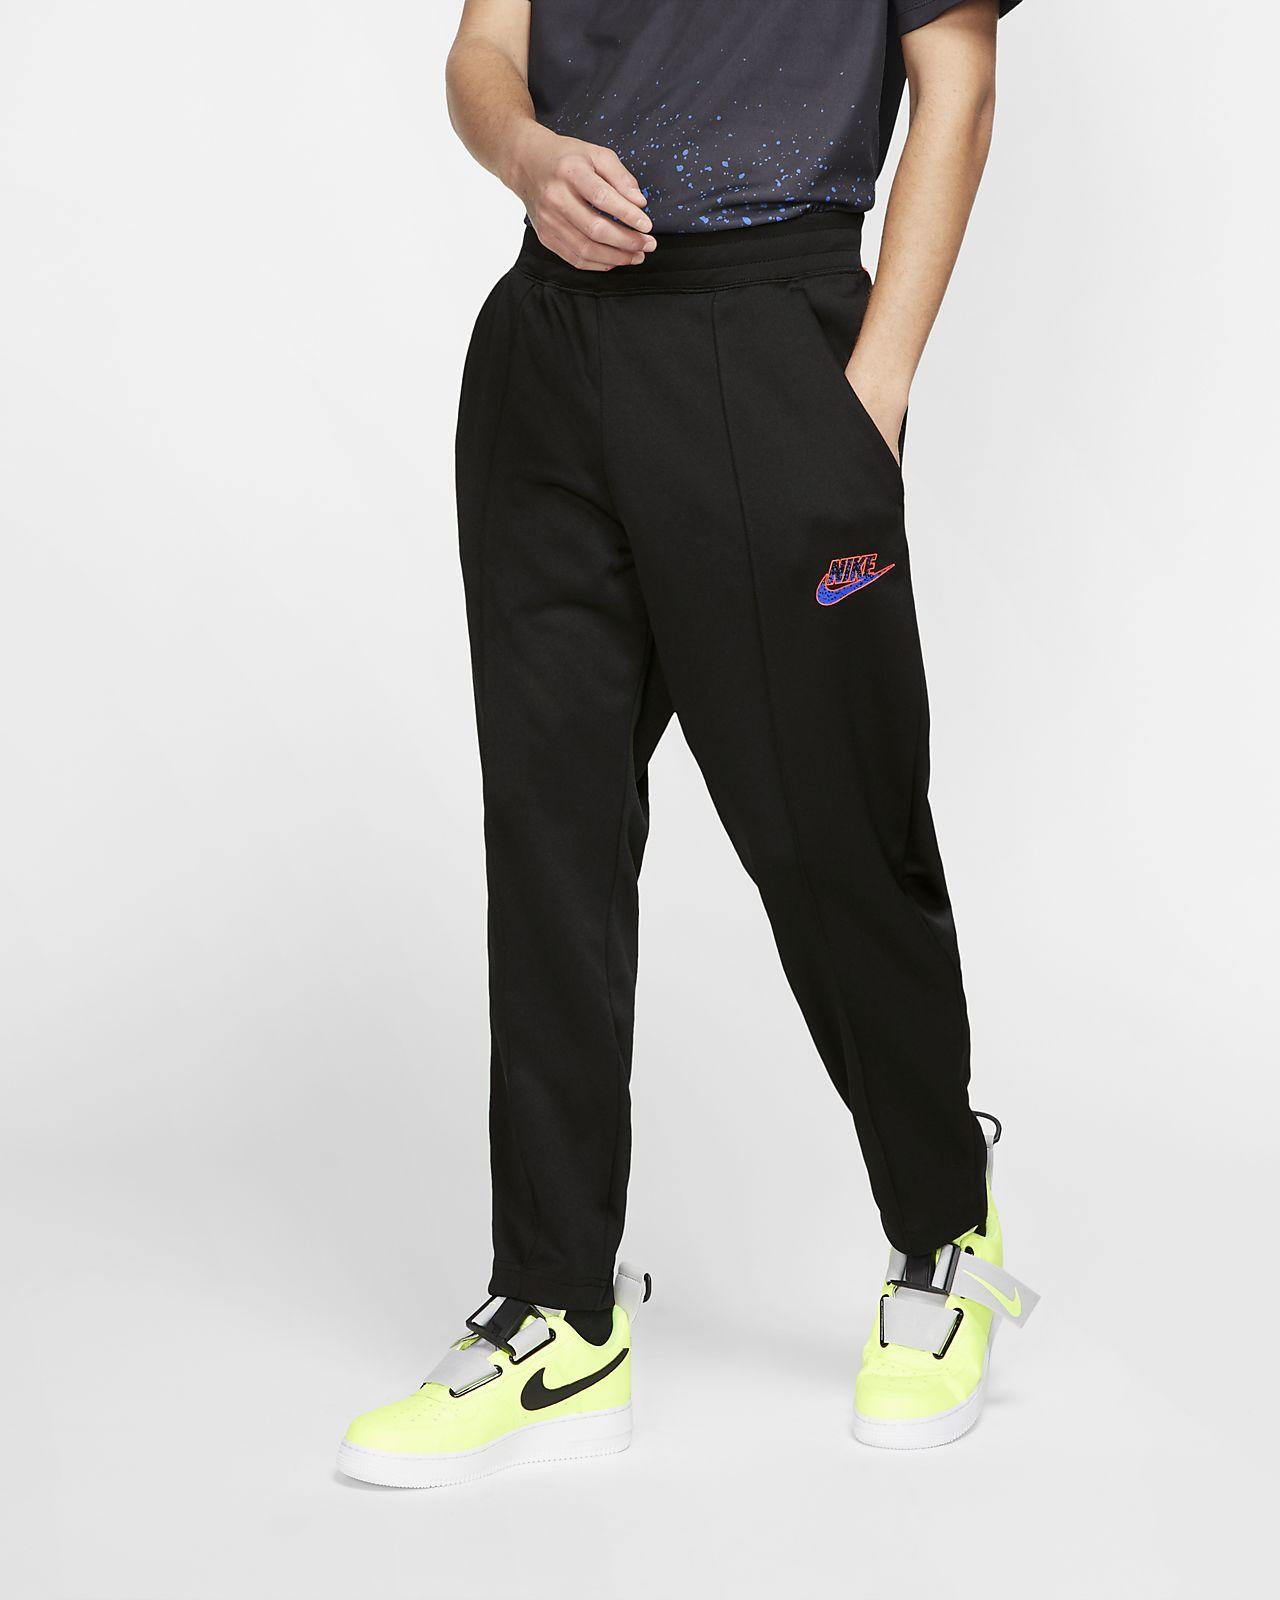 Nike Sportswear Pantalón - Hombre